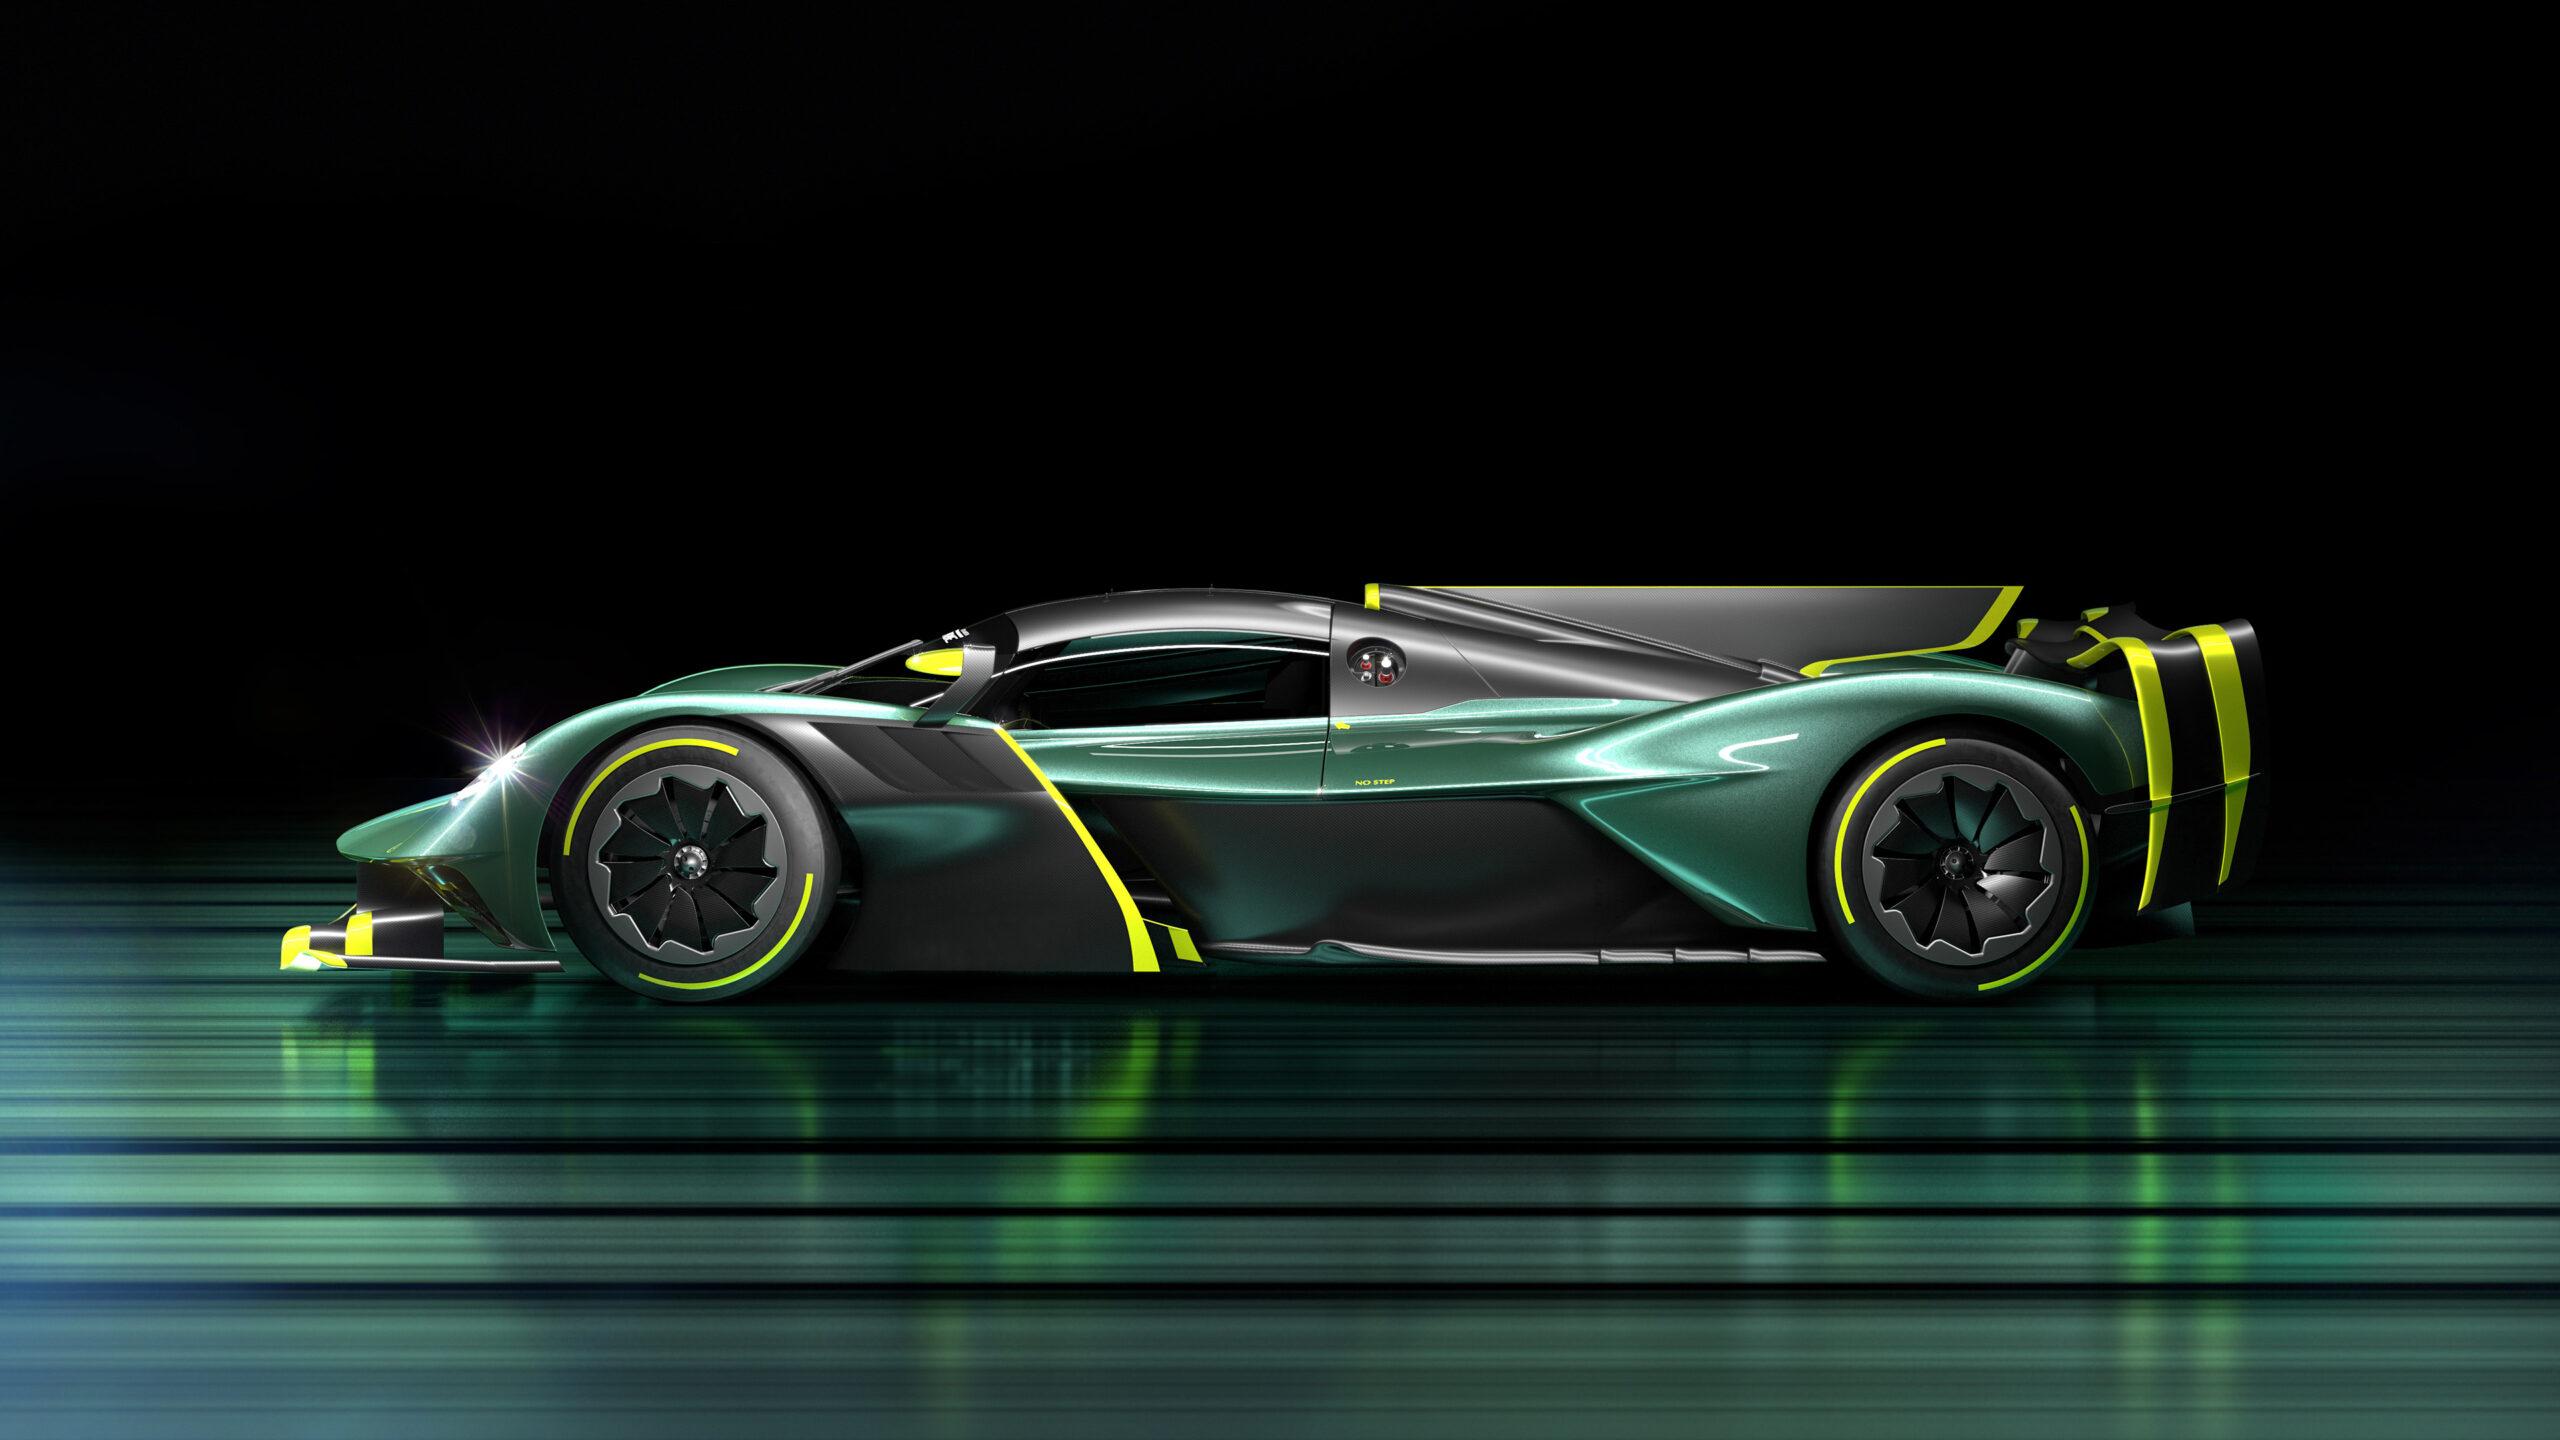 Aston Martin Valkyrie AMR Pro Side Profile